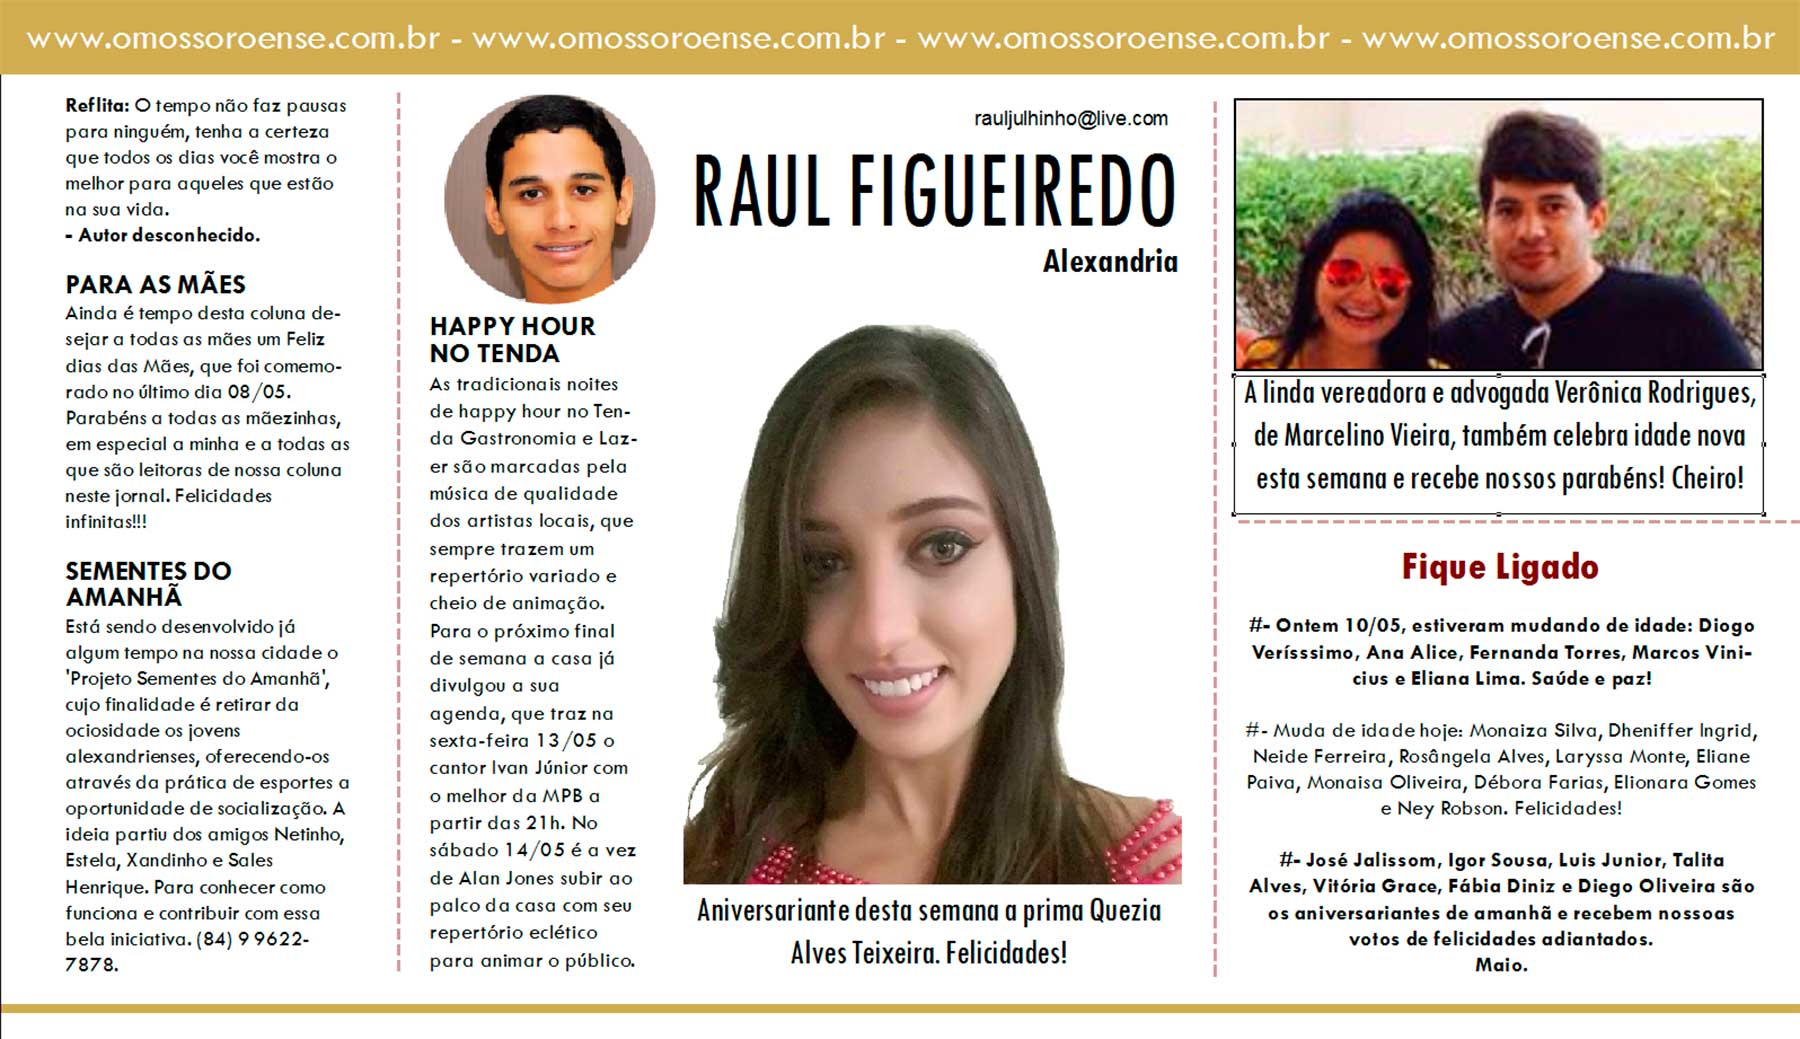 RAUL-FIGUEIREDO---11-05-2016